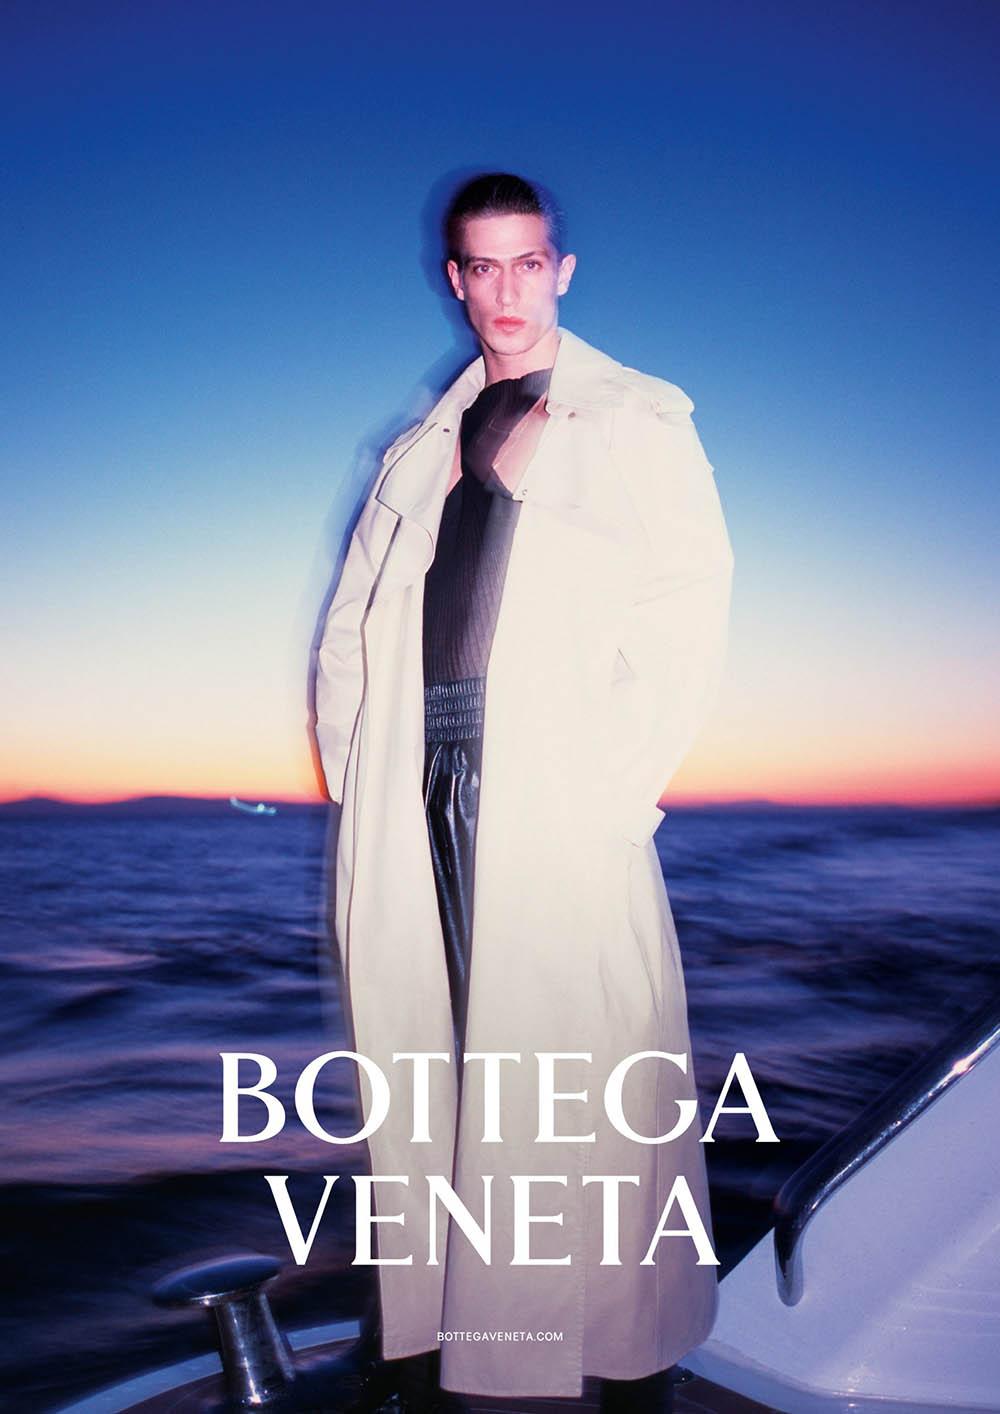 Bottega Veneta Spring Summer 2020 Campaign